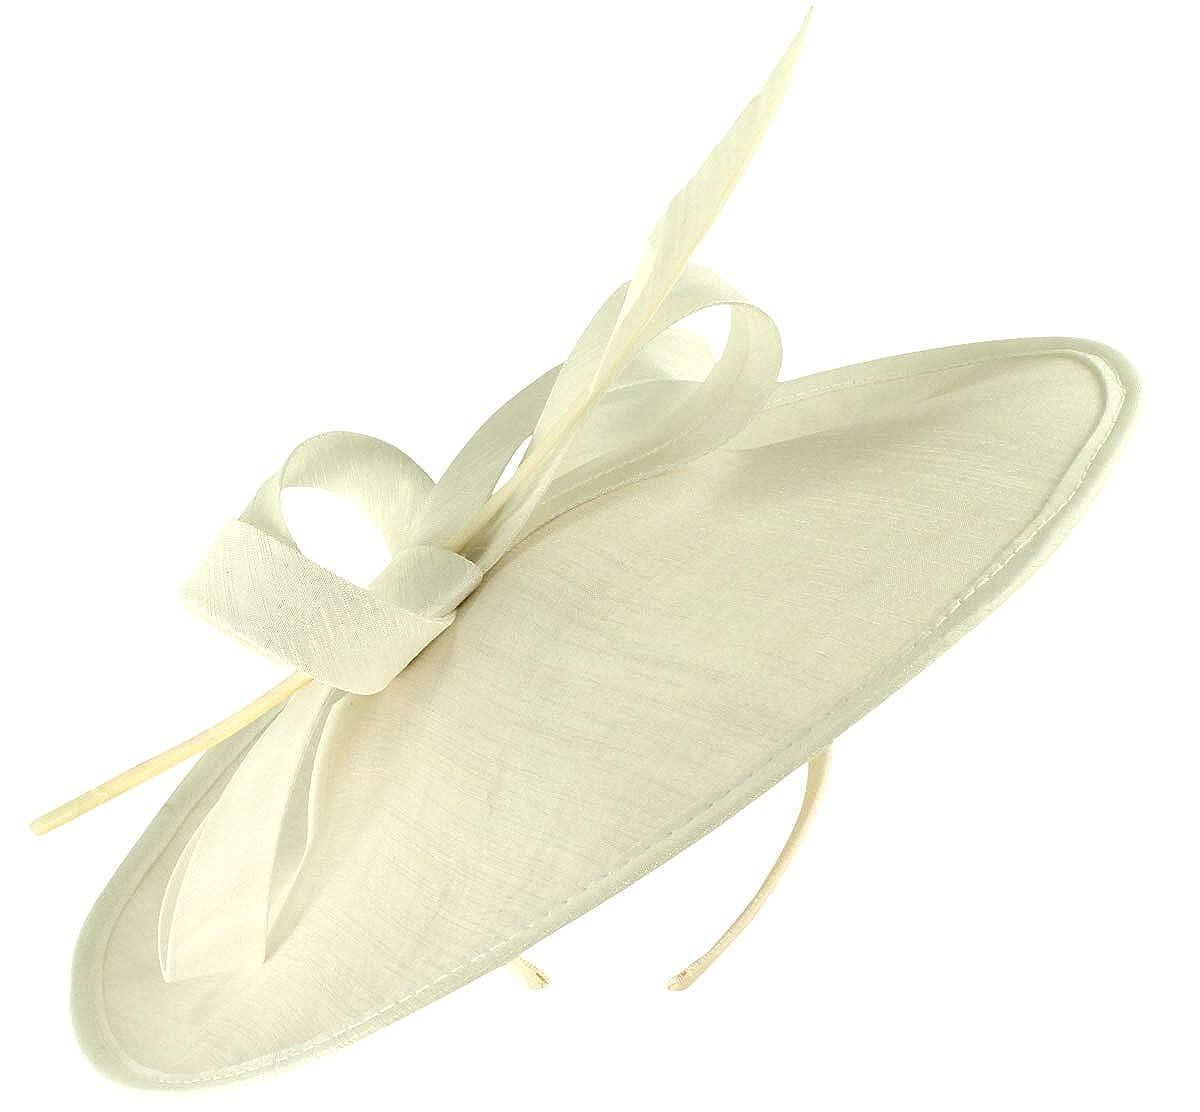 Failsworth Millinery Silk Disc Headpiece